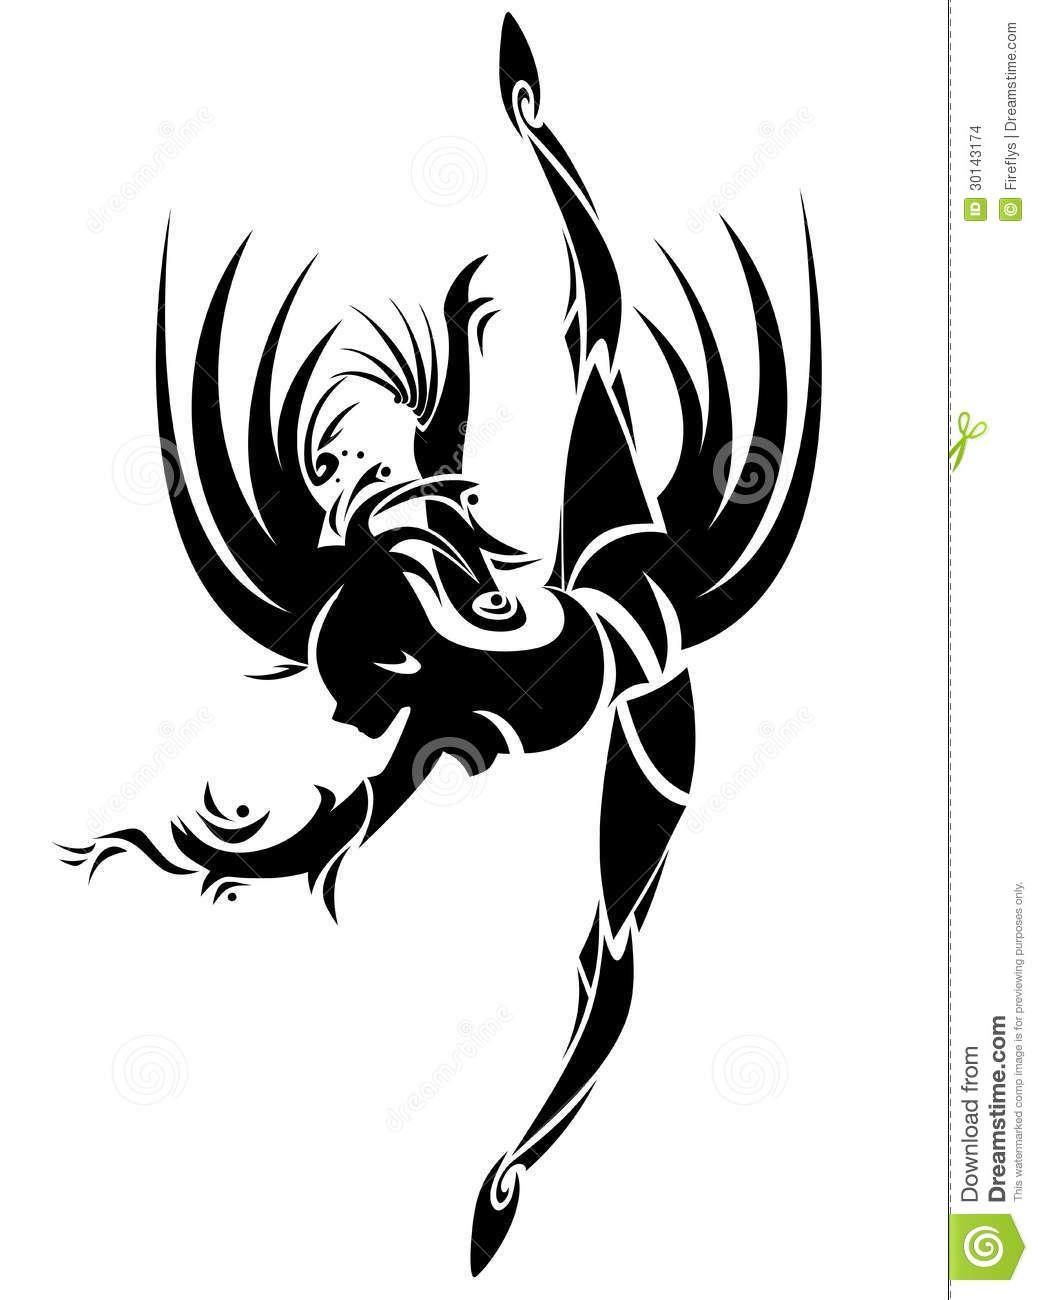 Dessin tribal simple galerie tatouage for Female silhouette tattoo